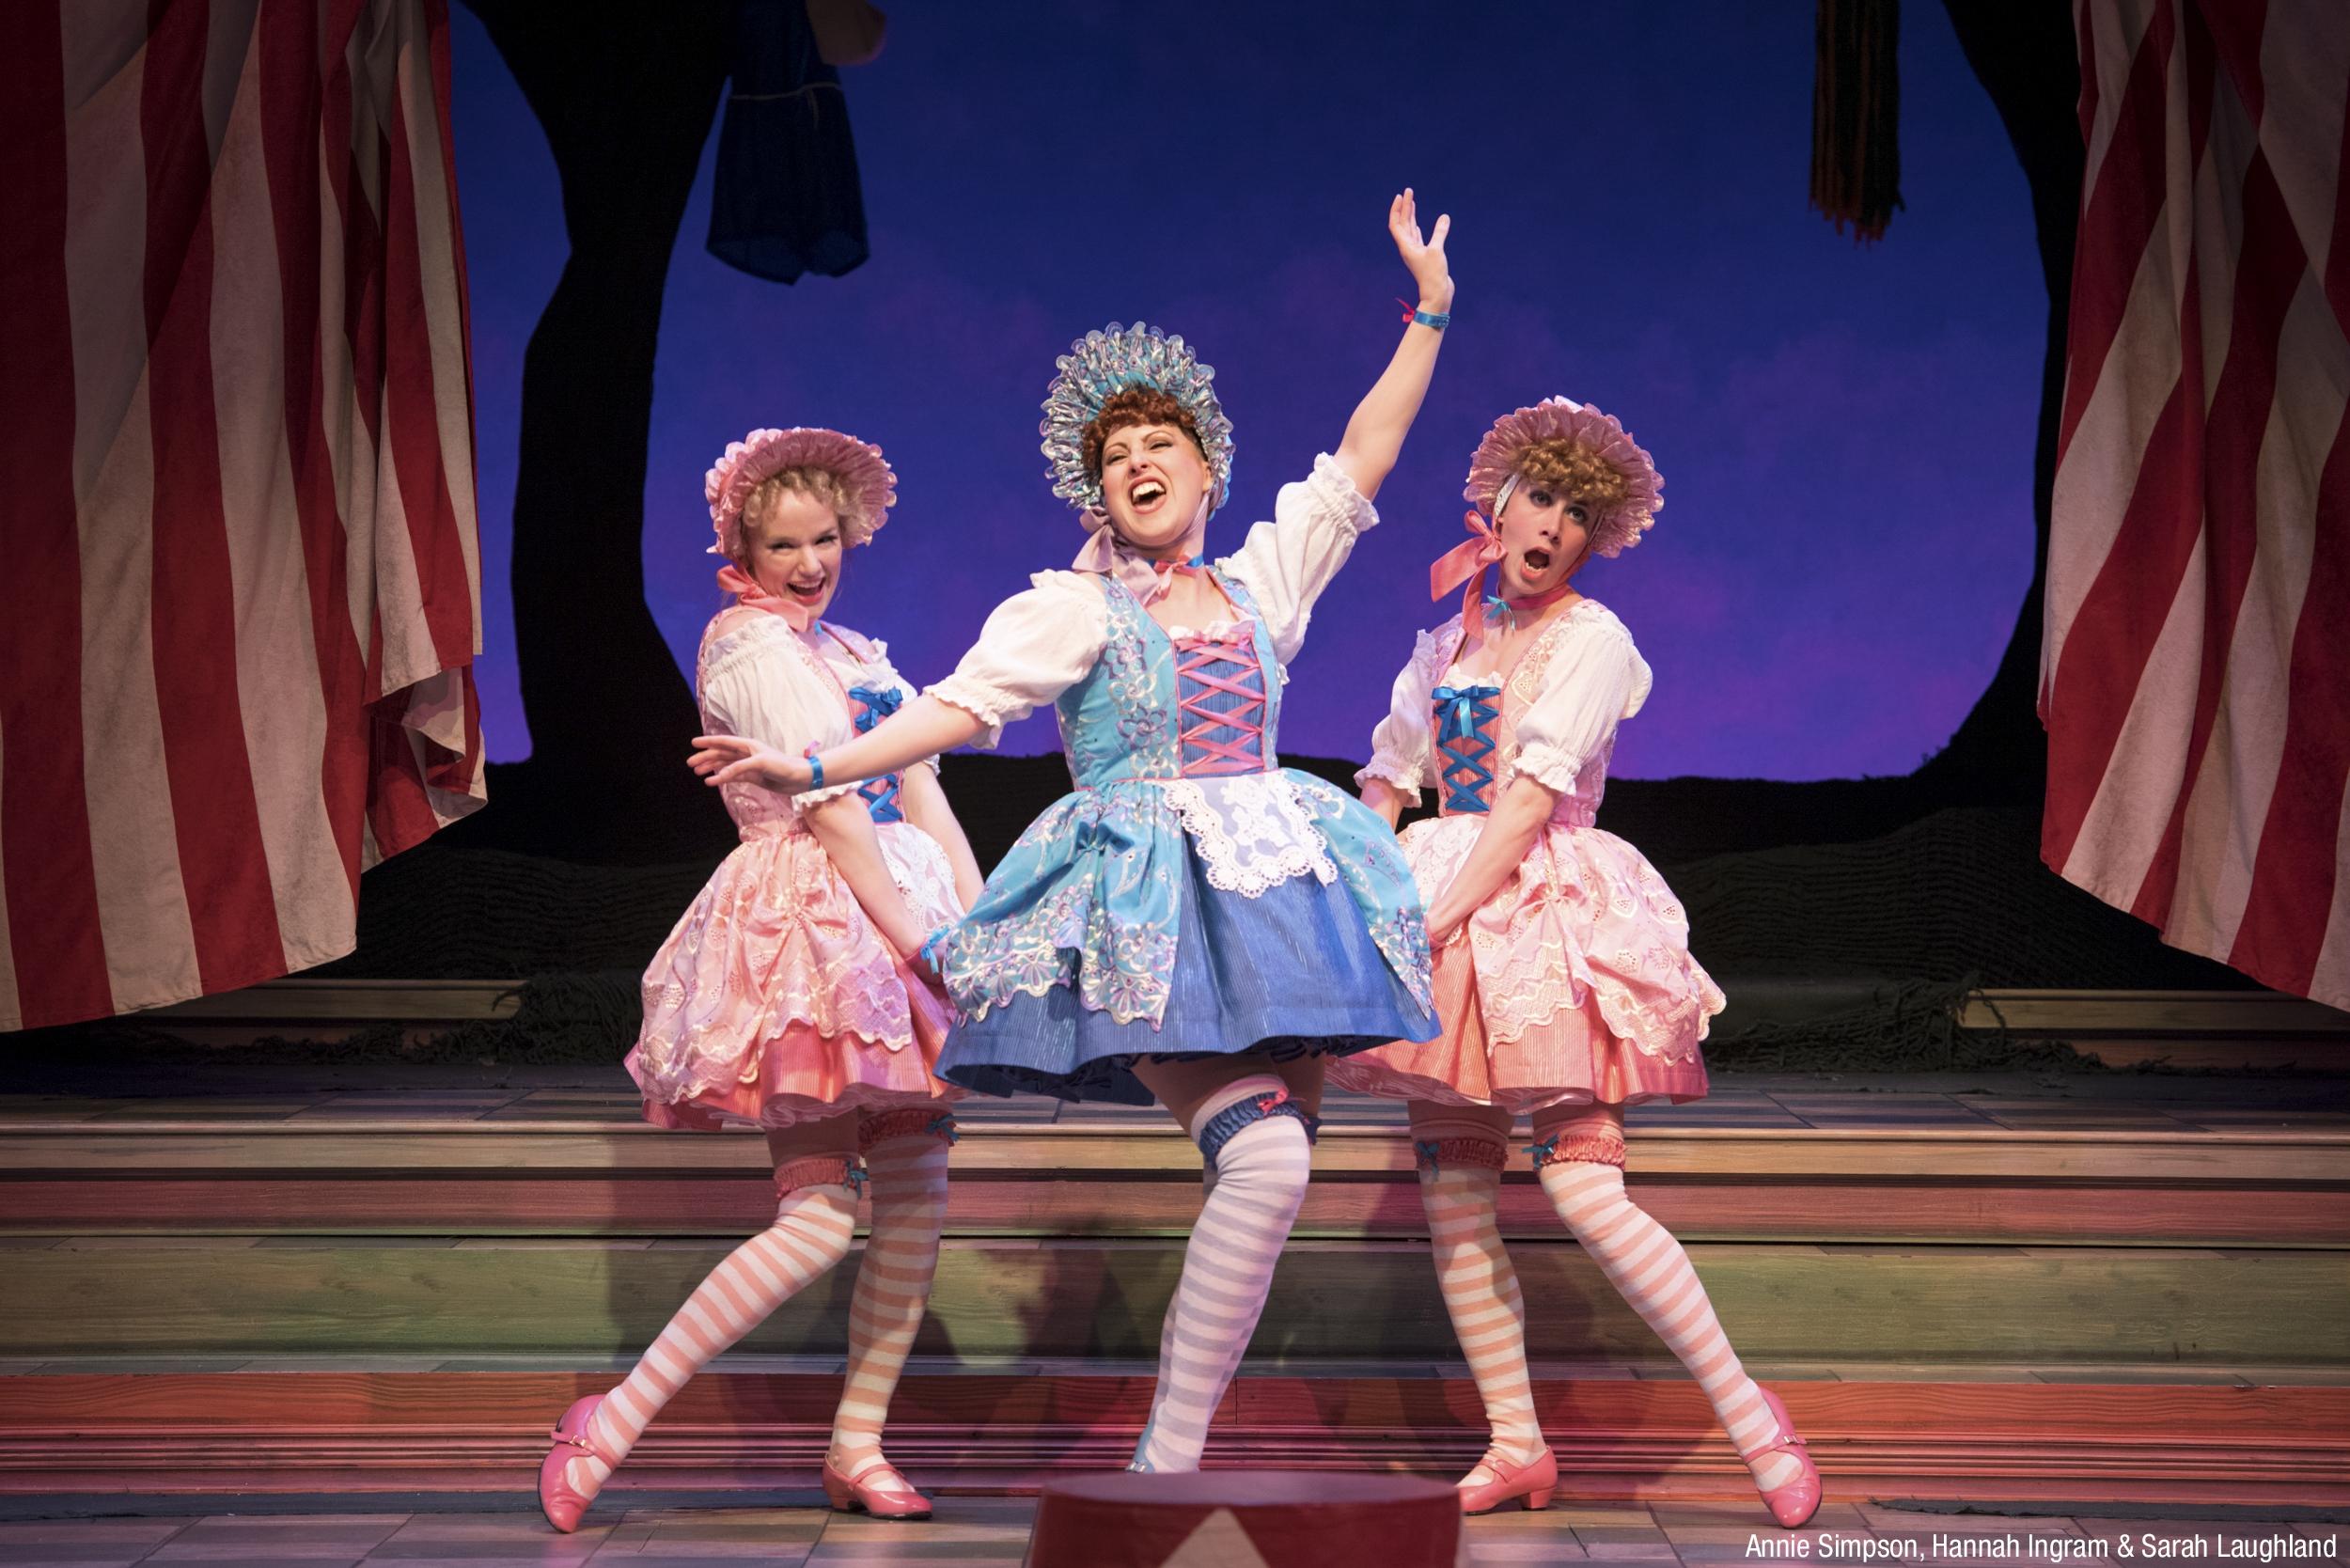 Actors on stage at Barter Theatre in Abingdon, VA